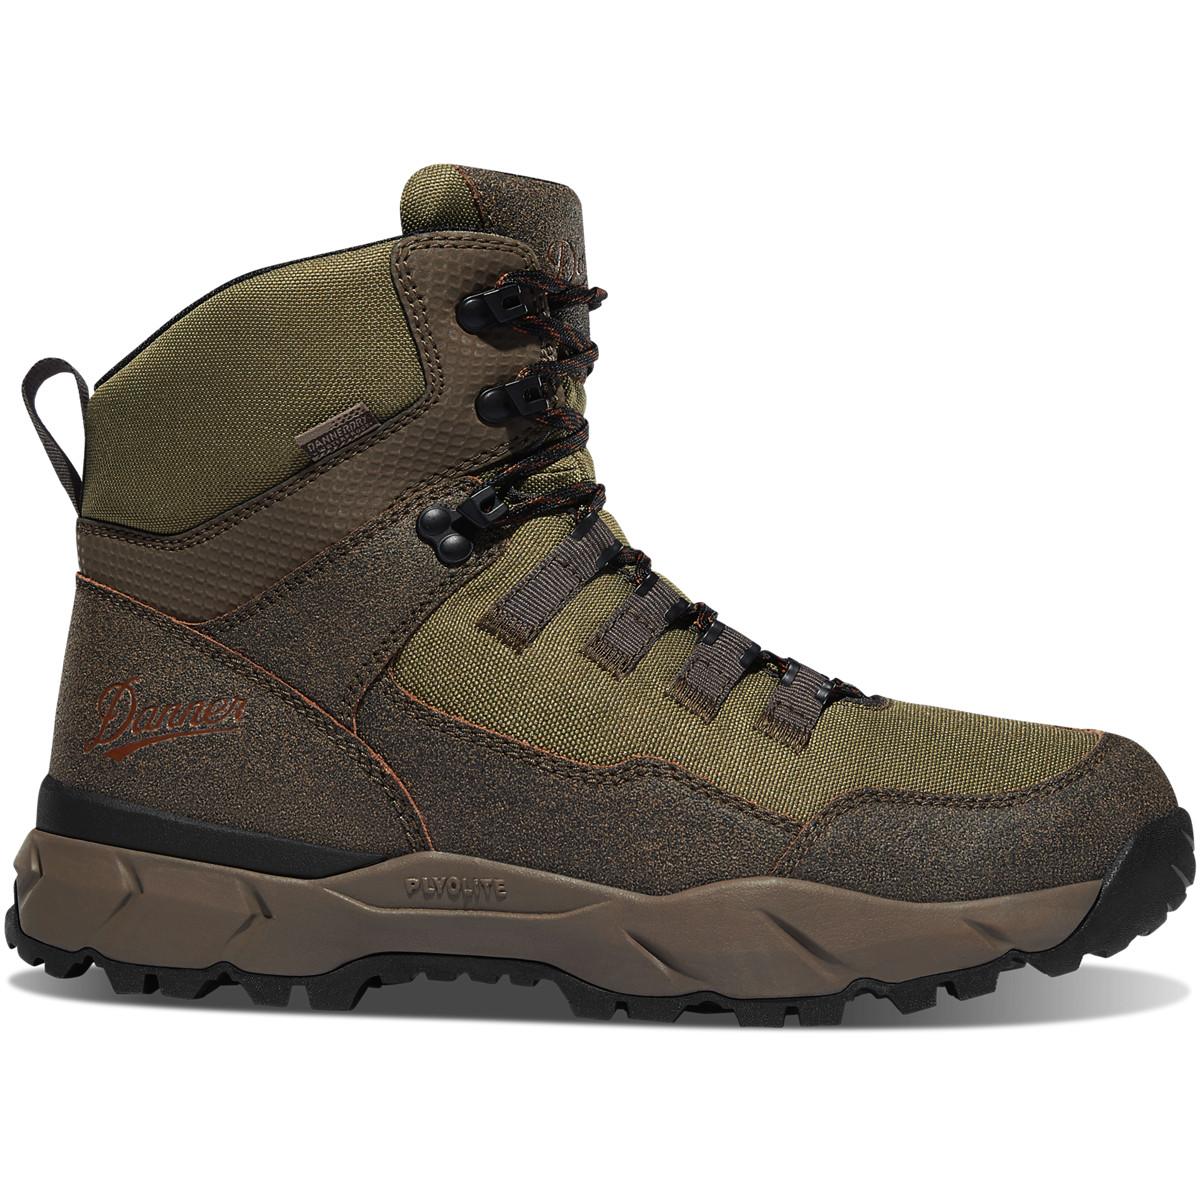 "Vital Trail 5"" Brown/Olive"